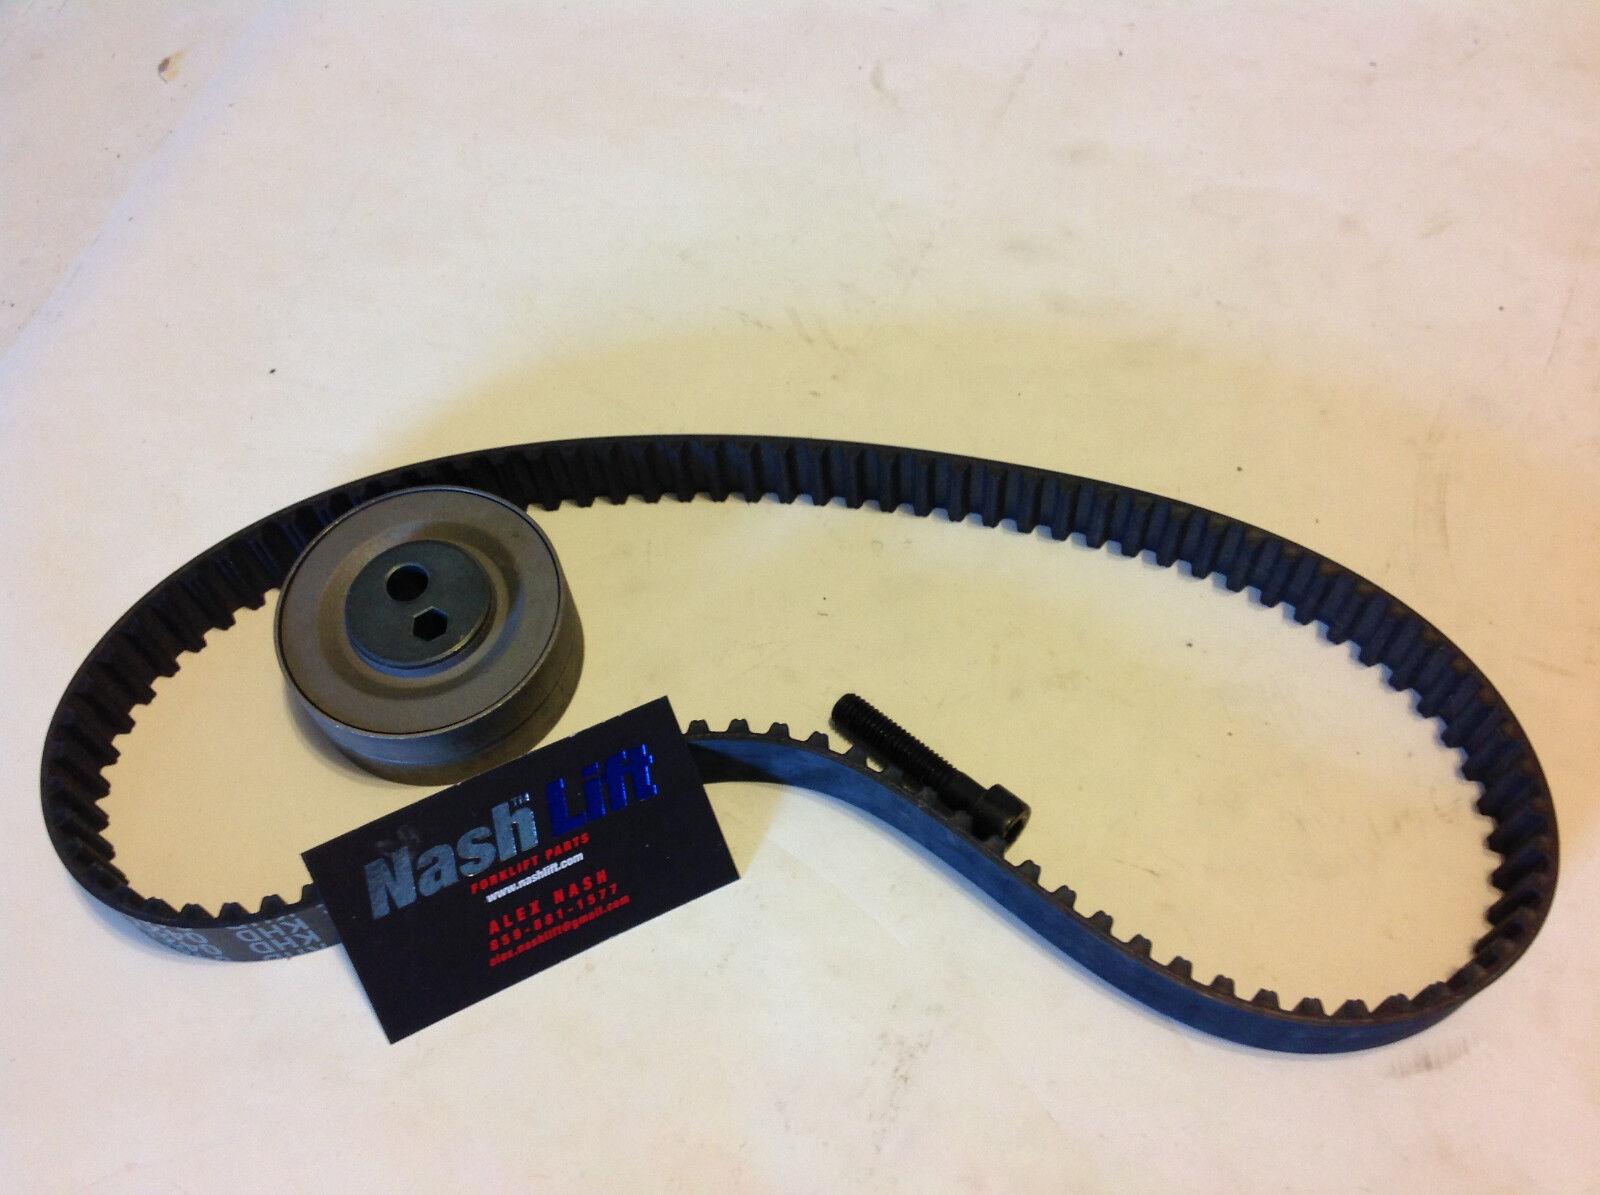 Dtz2929933 Jlg Dtz Timing Belt Kit Ebay Toyota 4y Engine Marks Norton Secured Powered By Verisign